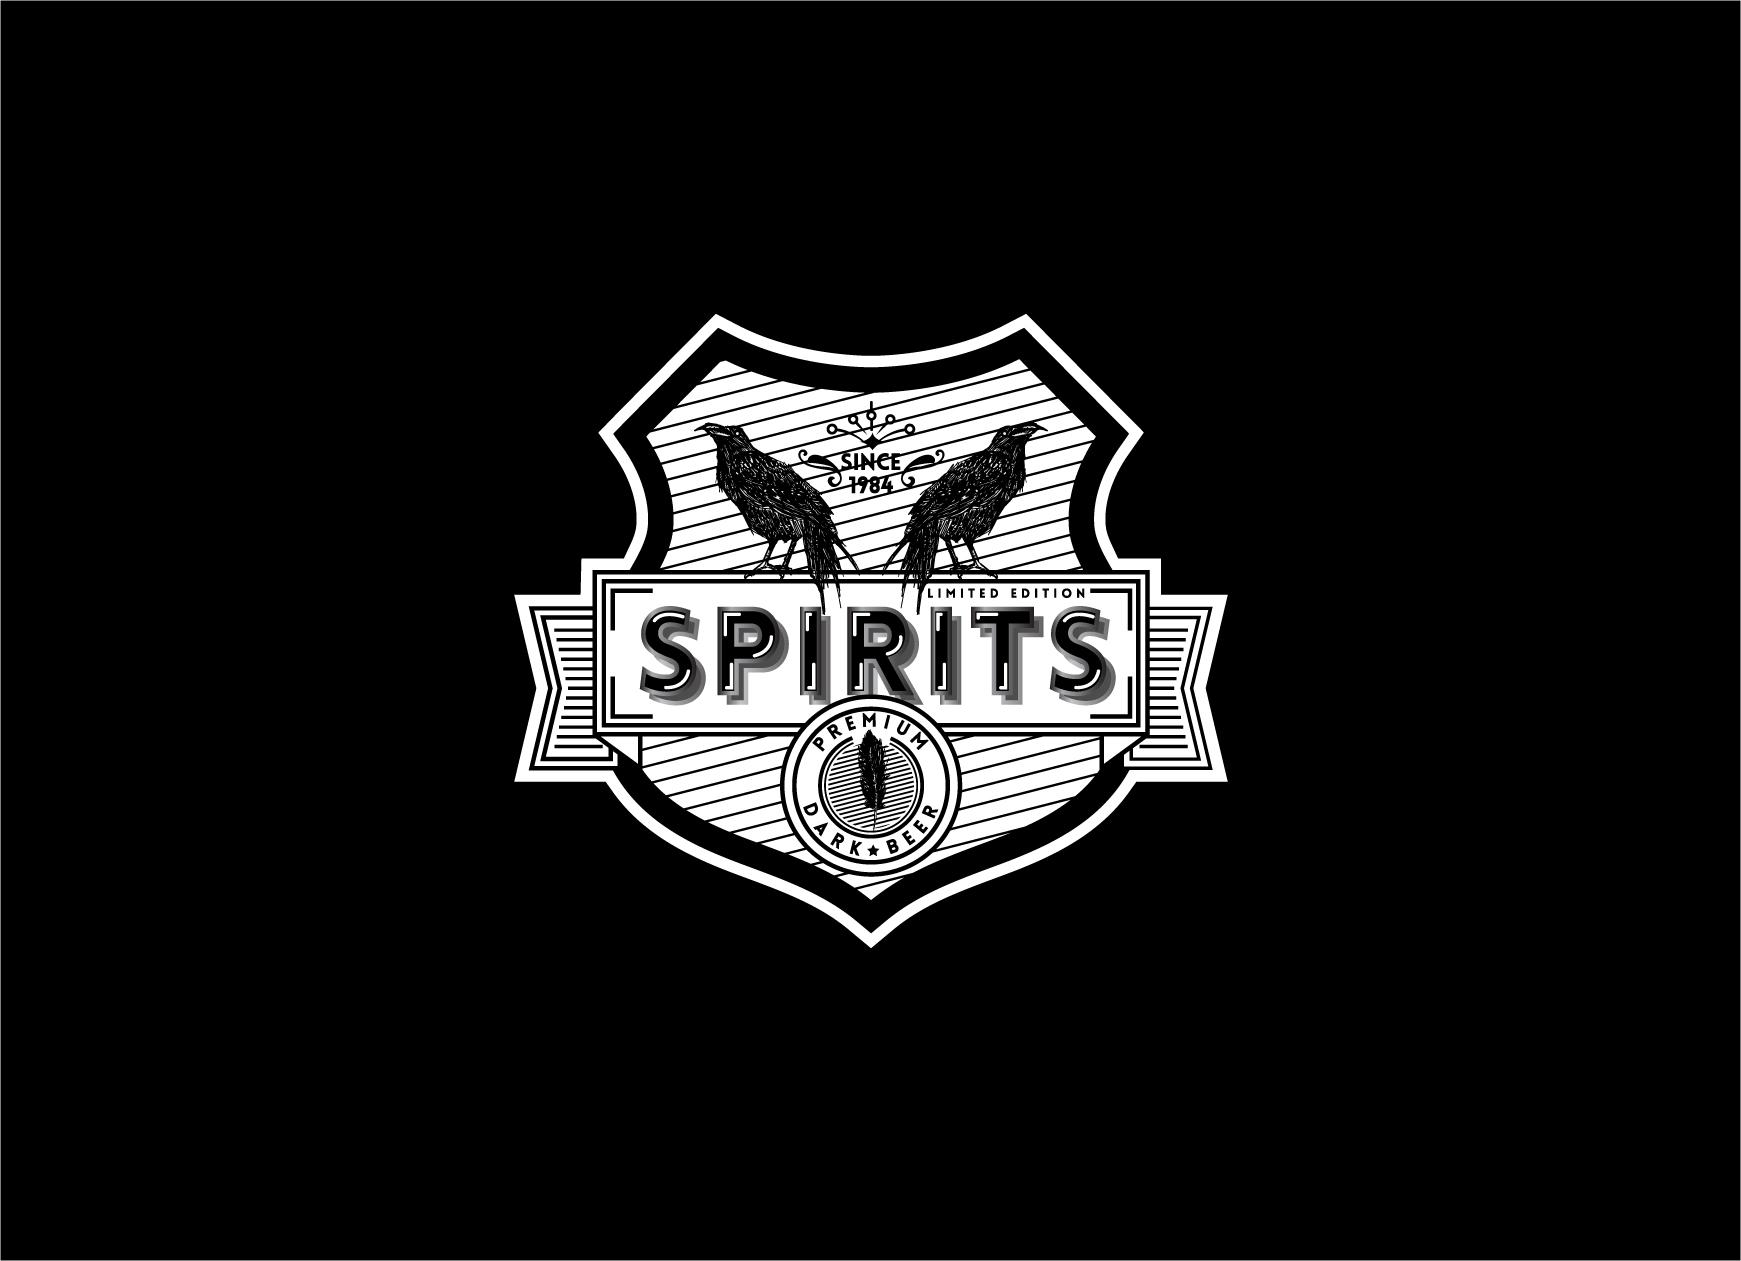 Spirits_Thumbnail.jpg